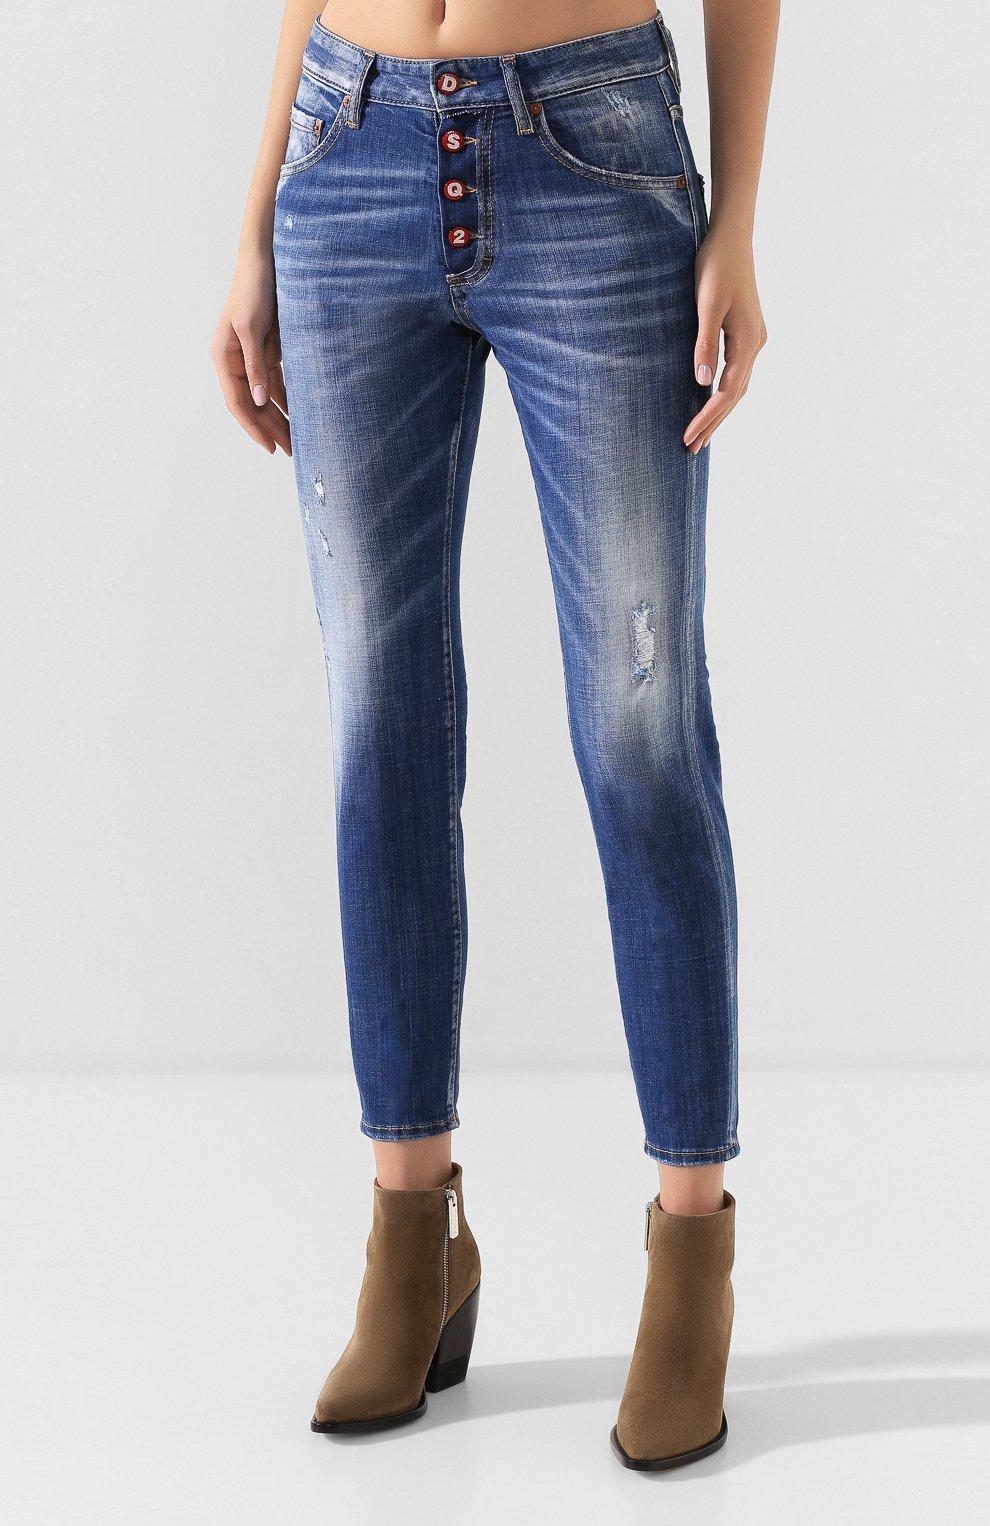 Женские джинсы DSQUARED2 синего цвета, арт. S72LB0287/S30342 | Фото 3